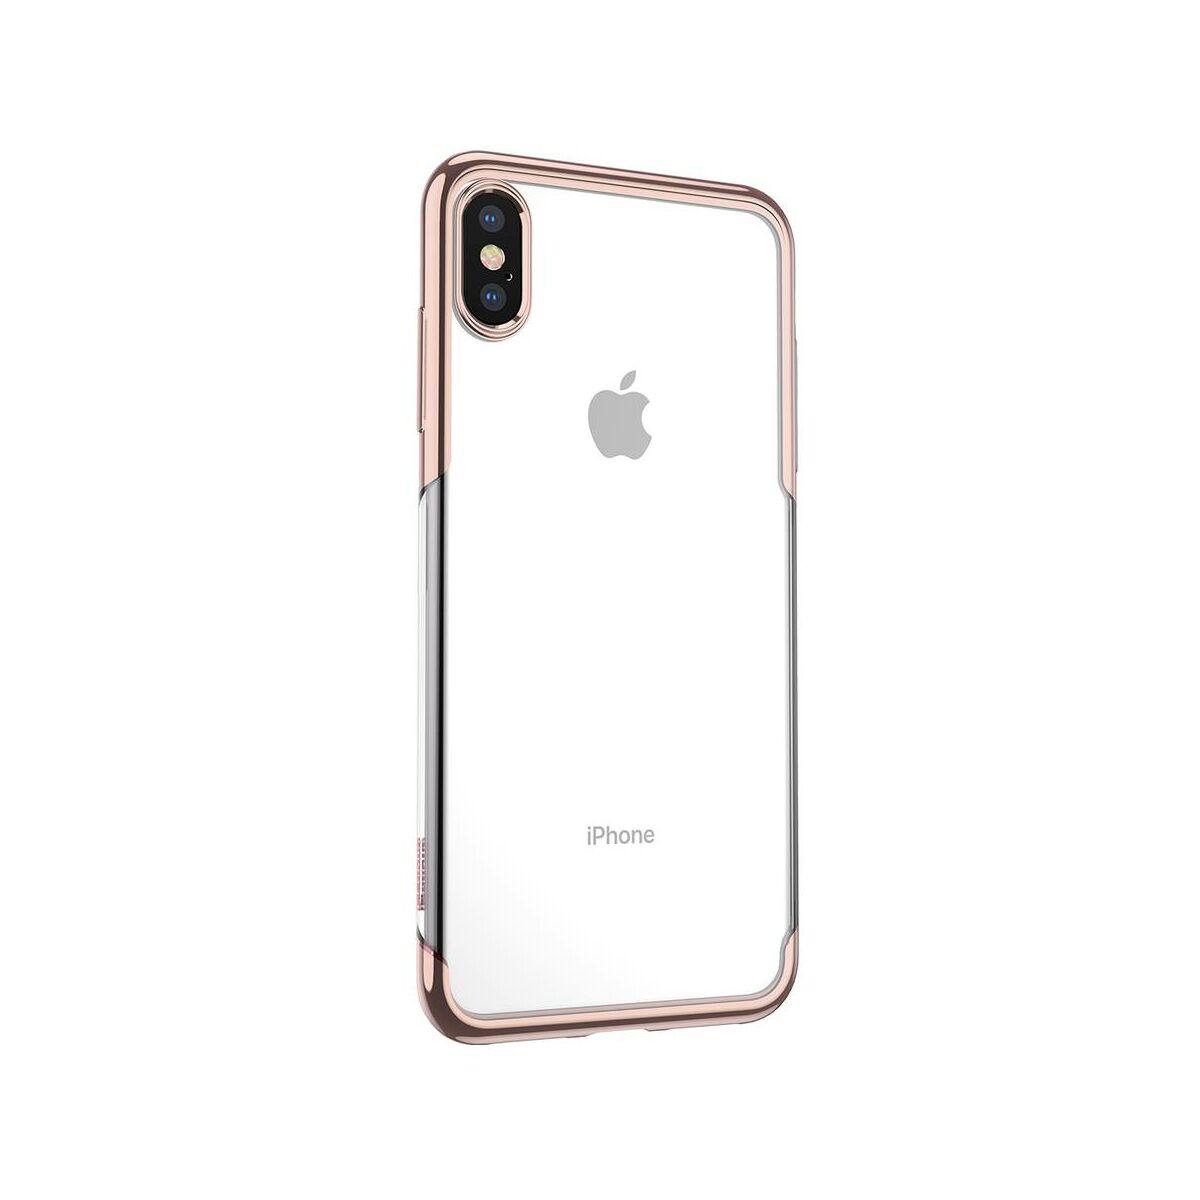 Baseus iPhone XS tok, Shining, arany (ARAPIPH58-MD0V)